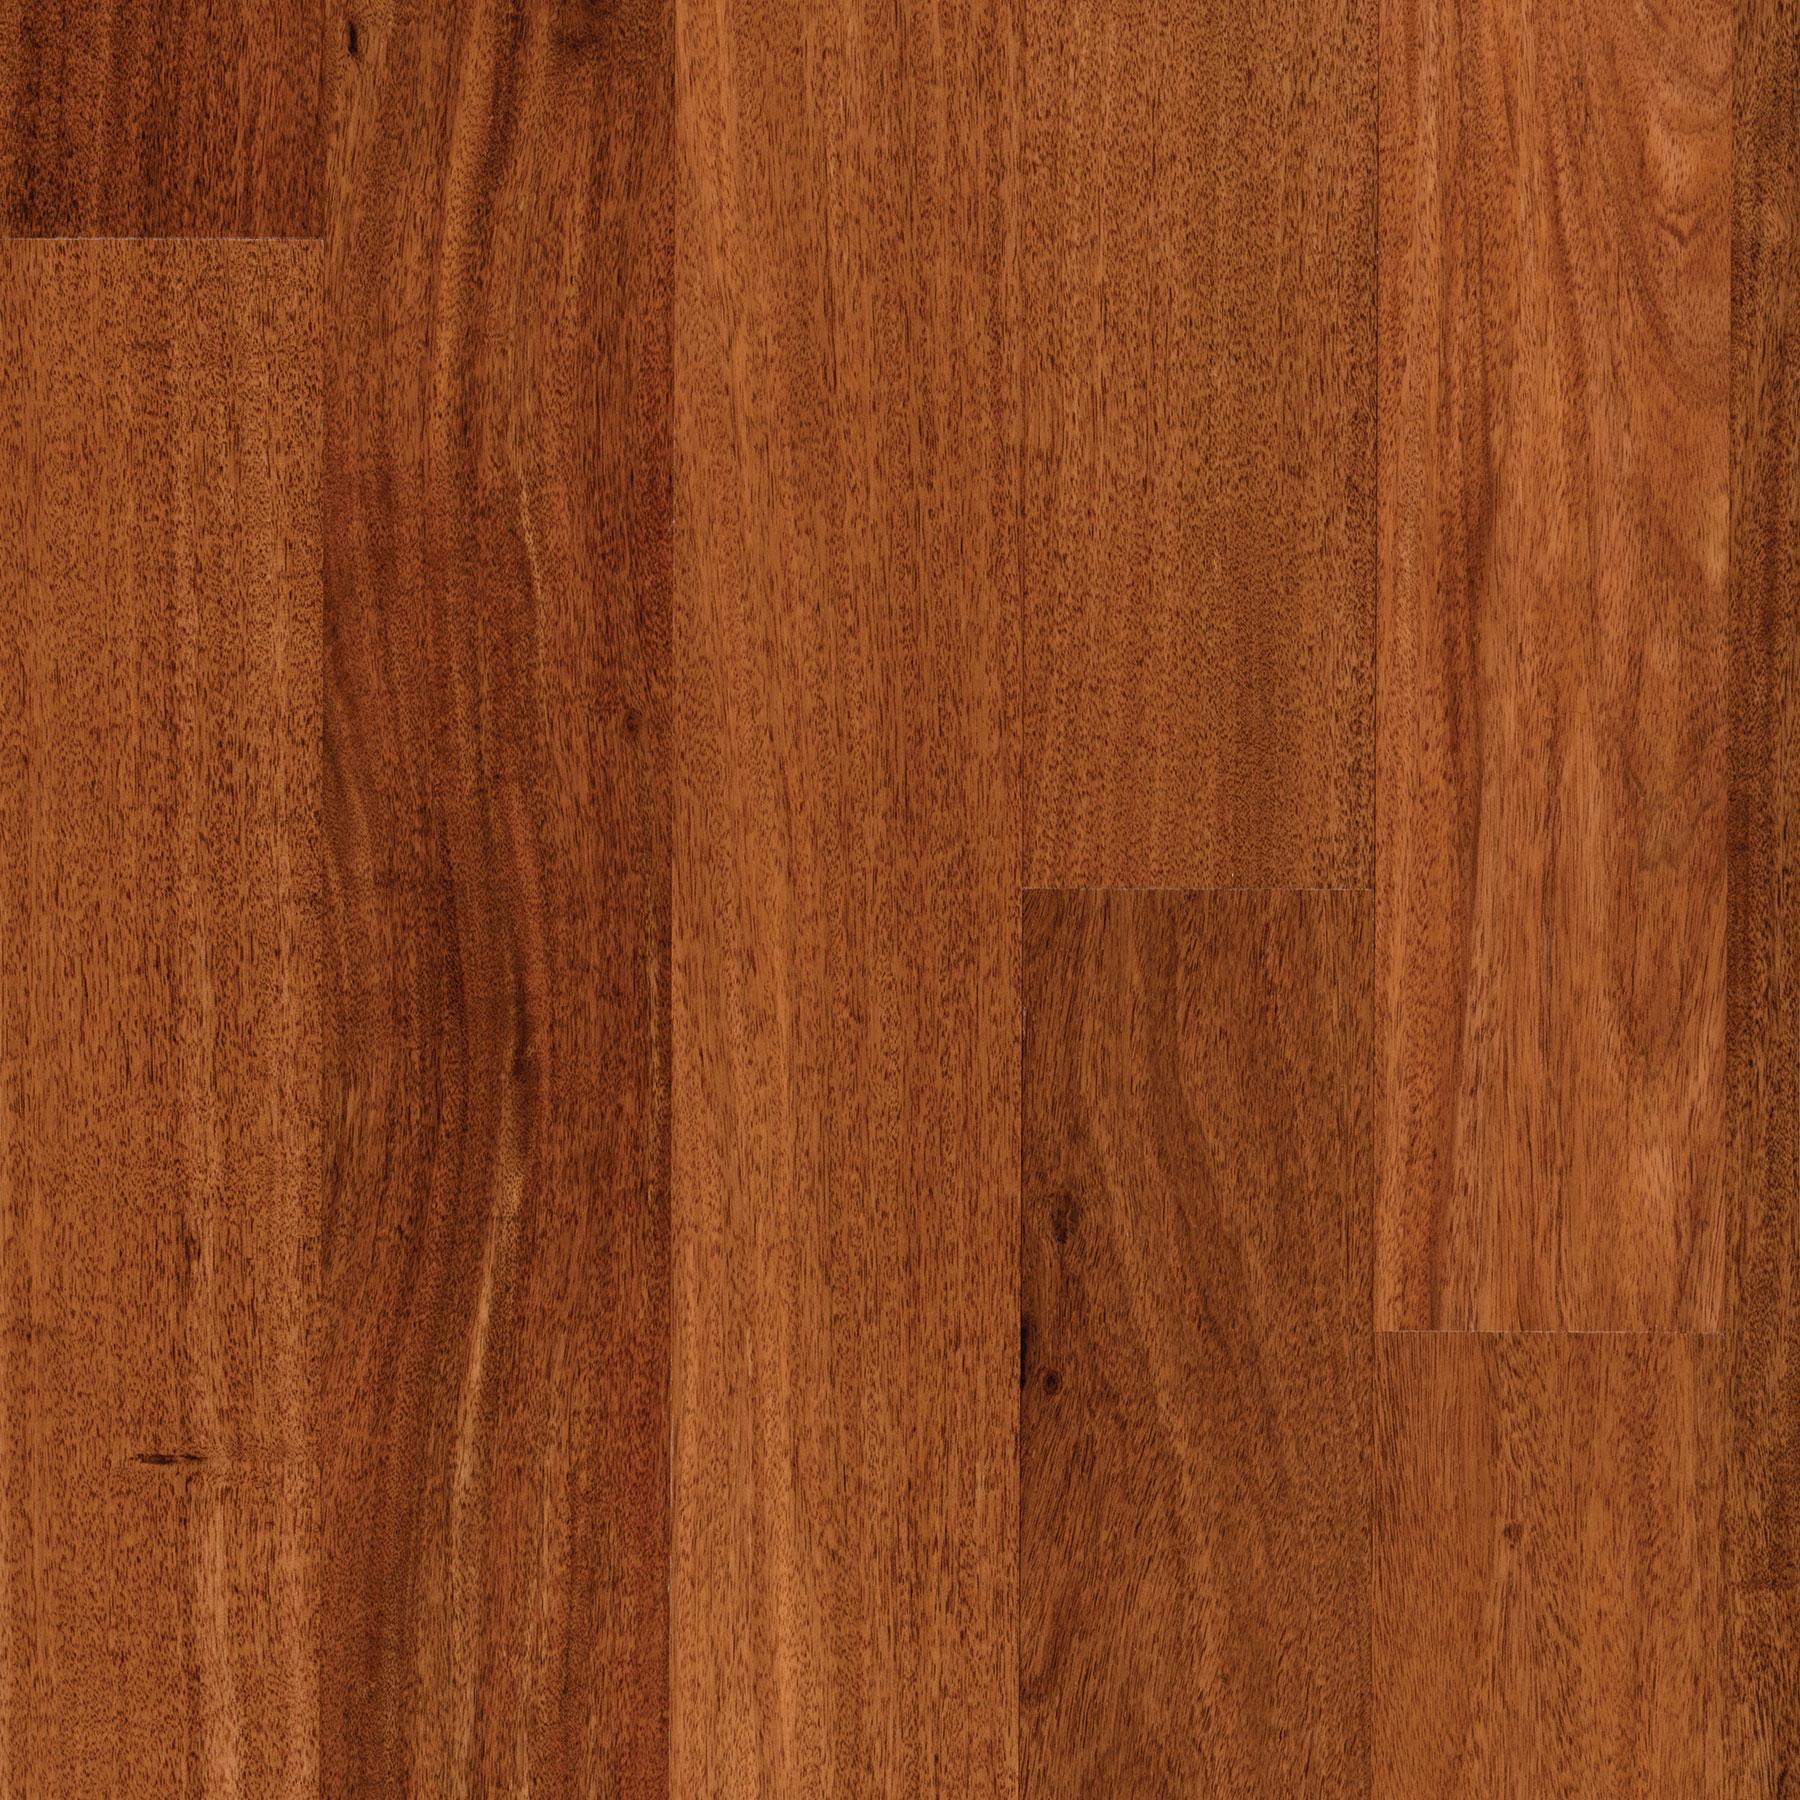 Mahogany Wood Color Variations ~ Belizean woods mahogany ″ etx surfaces